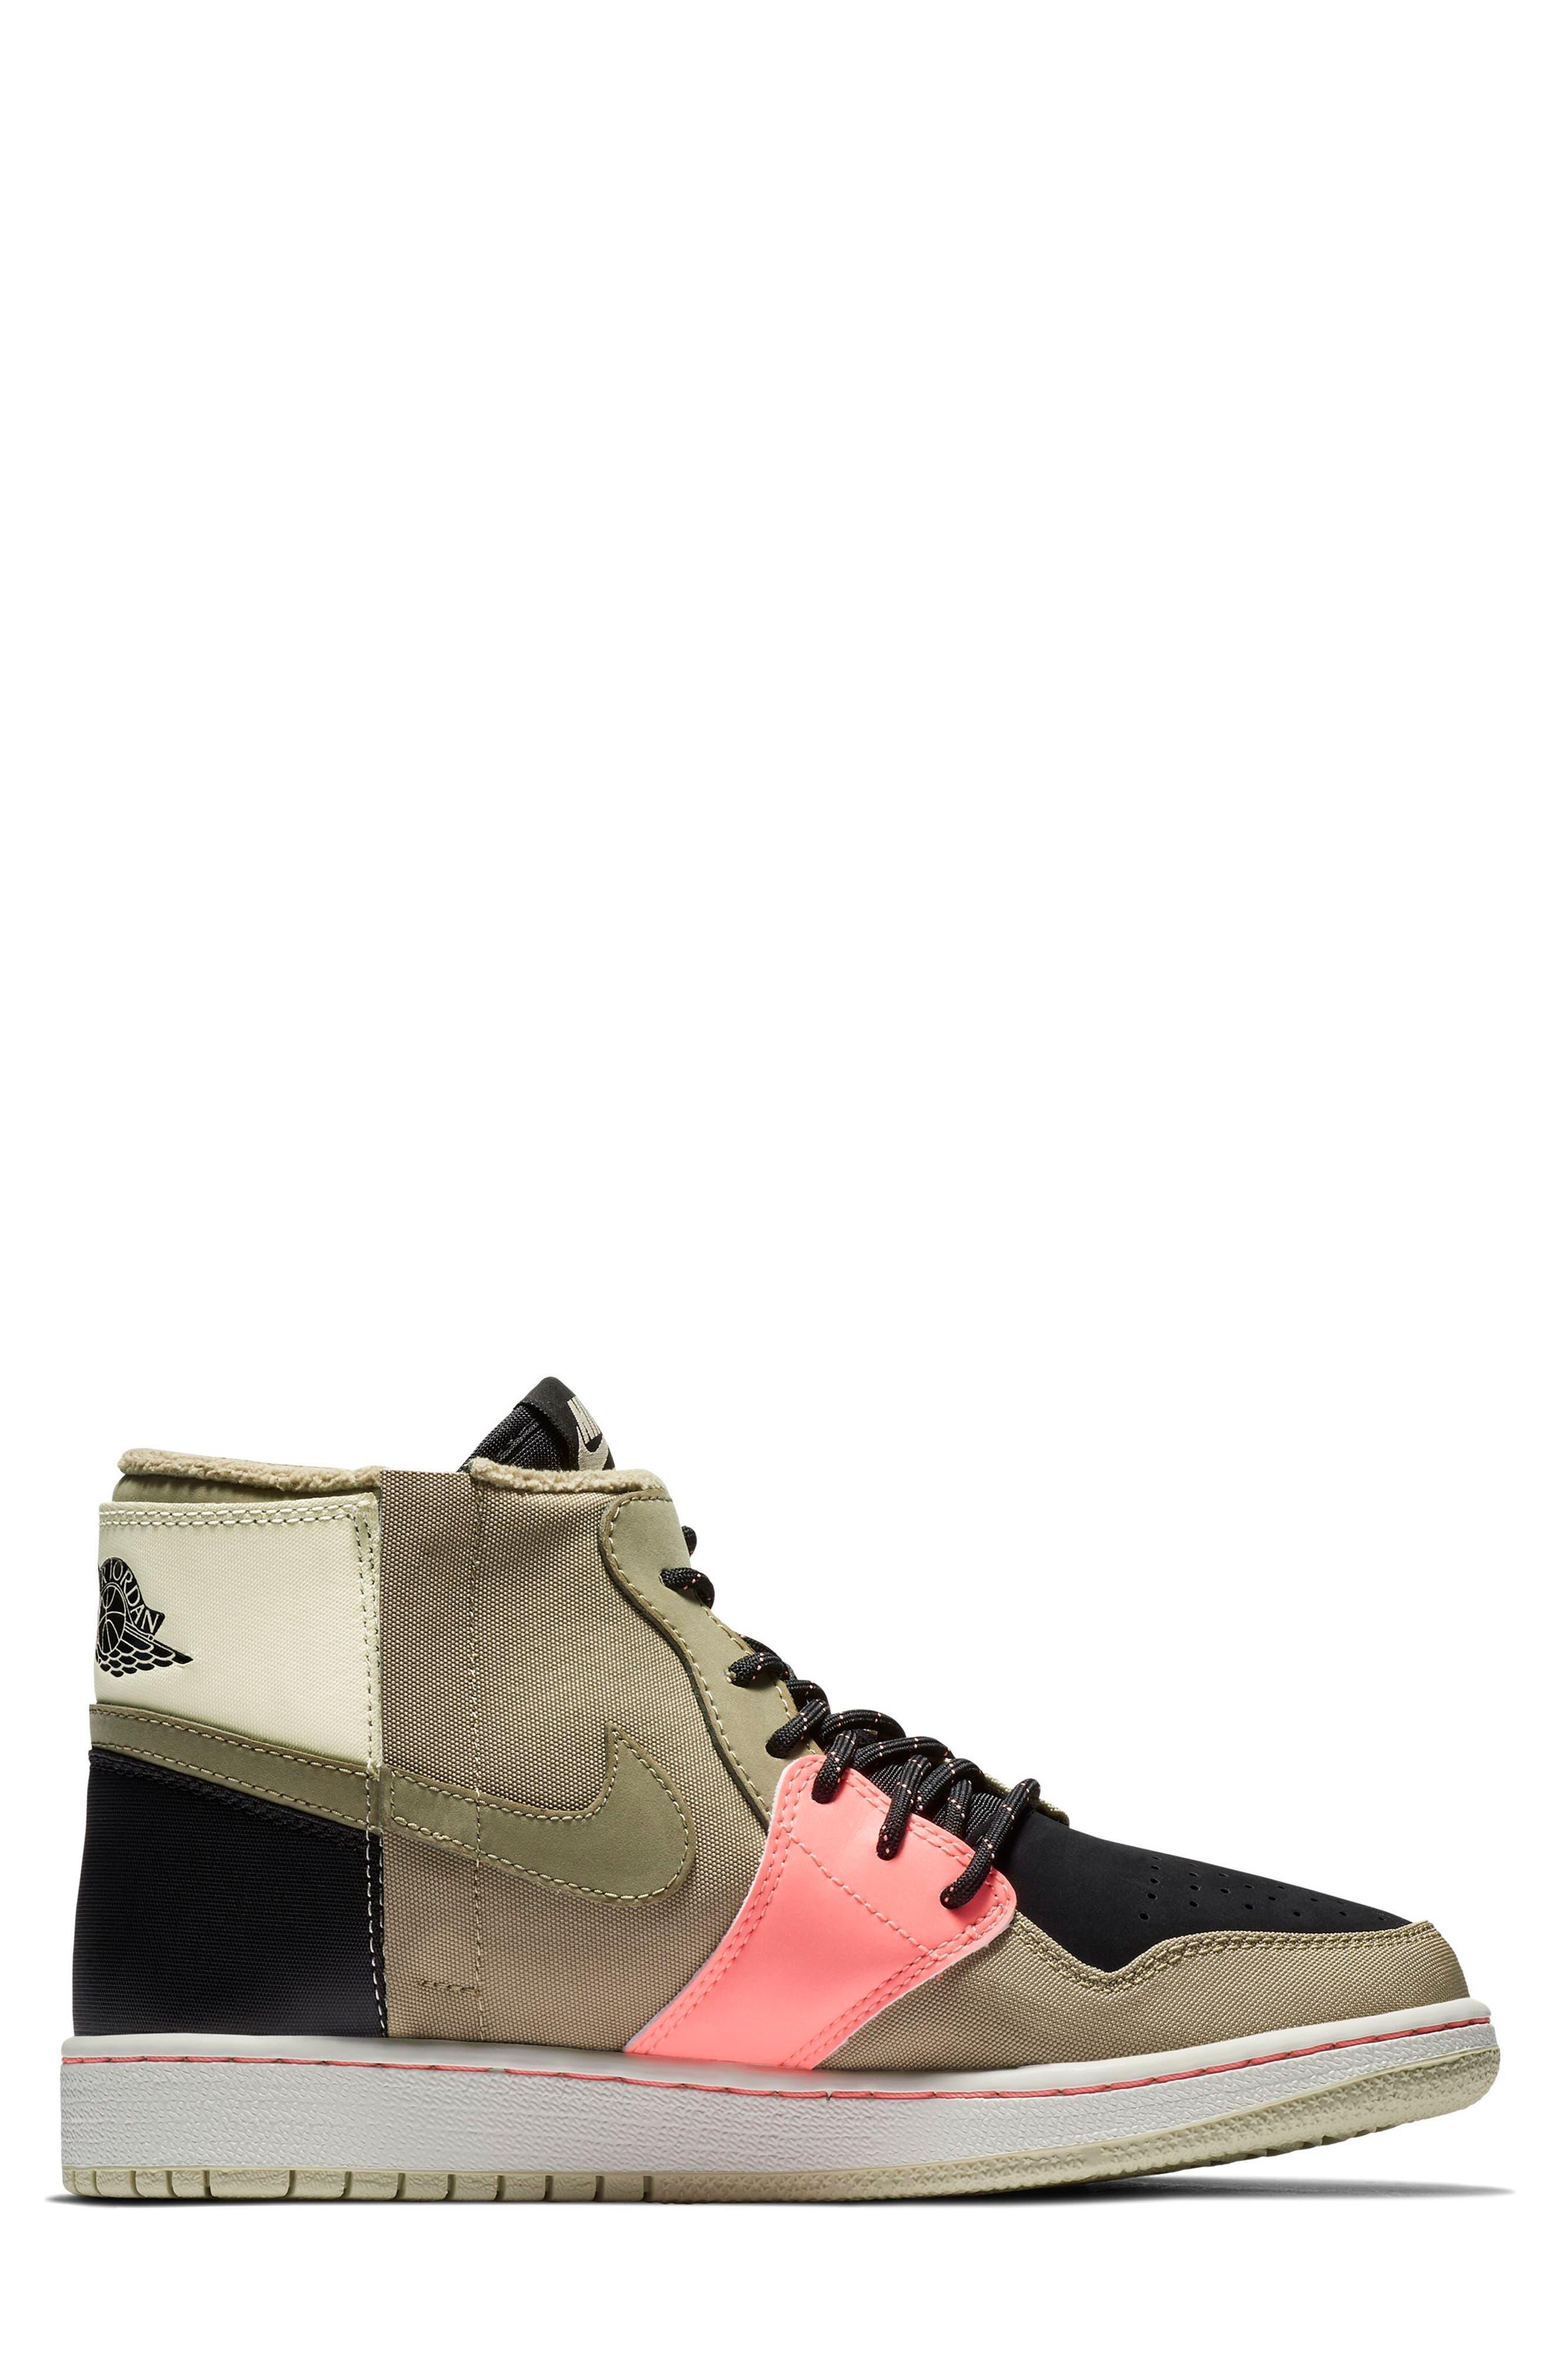 Air Jordan 1 Rebel XX Utility High Top Sneaker,                             Alternate thumbnail 6, color,                             PARACHUTE BEIGE